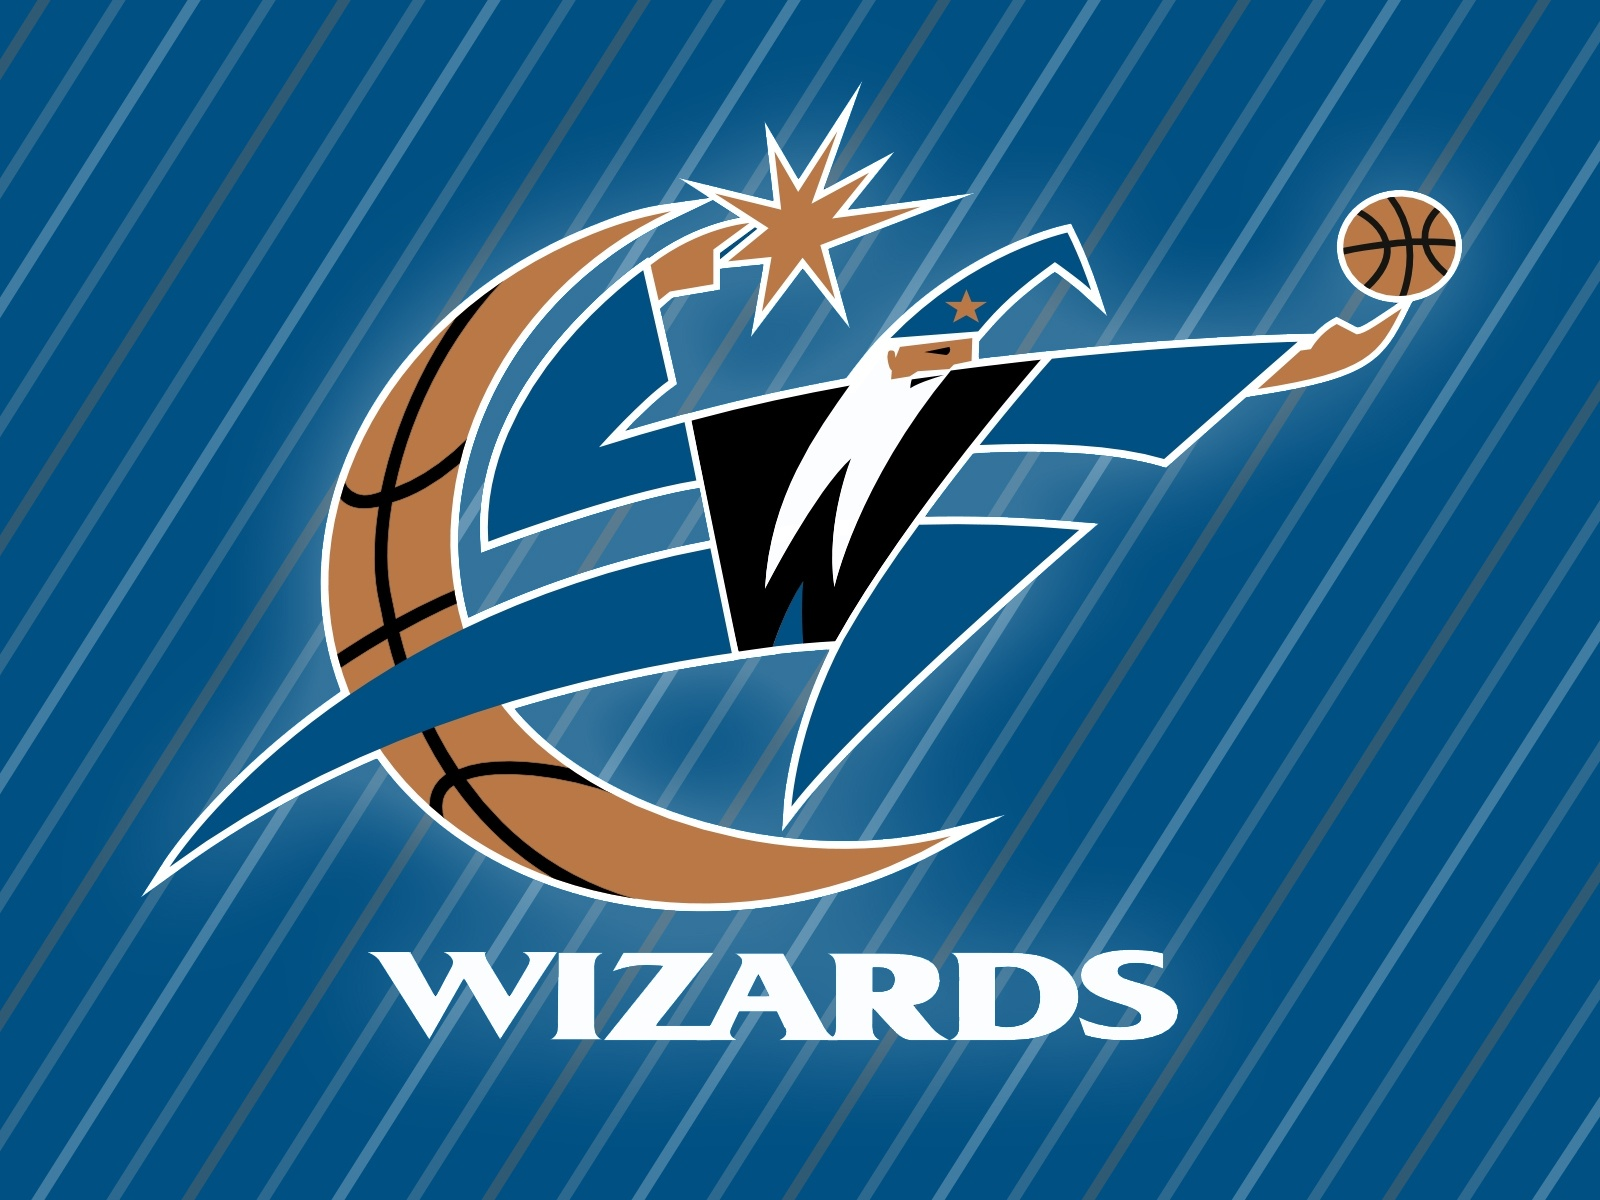 WASHINGTON WIZARDS nba basketball 37 wallpaper 1600x1200 226688 1600x1200